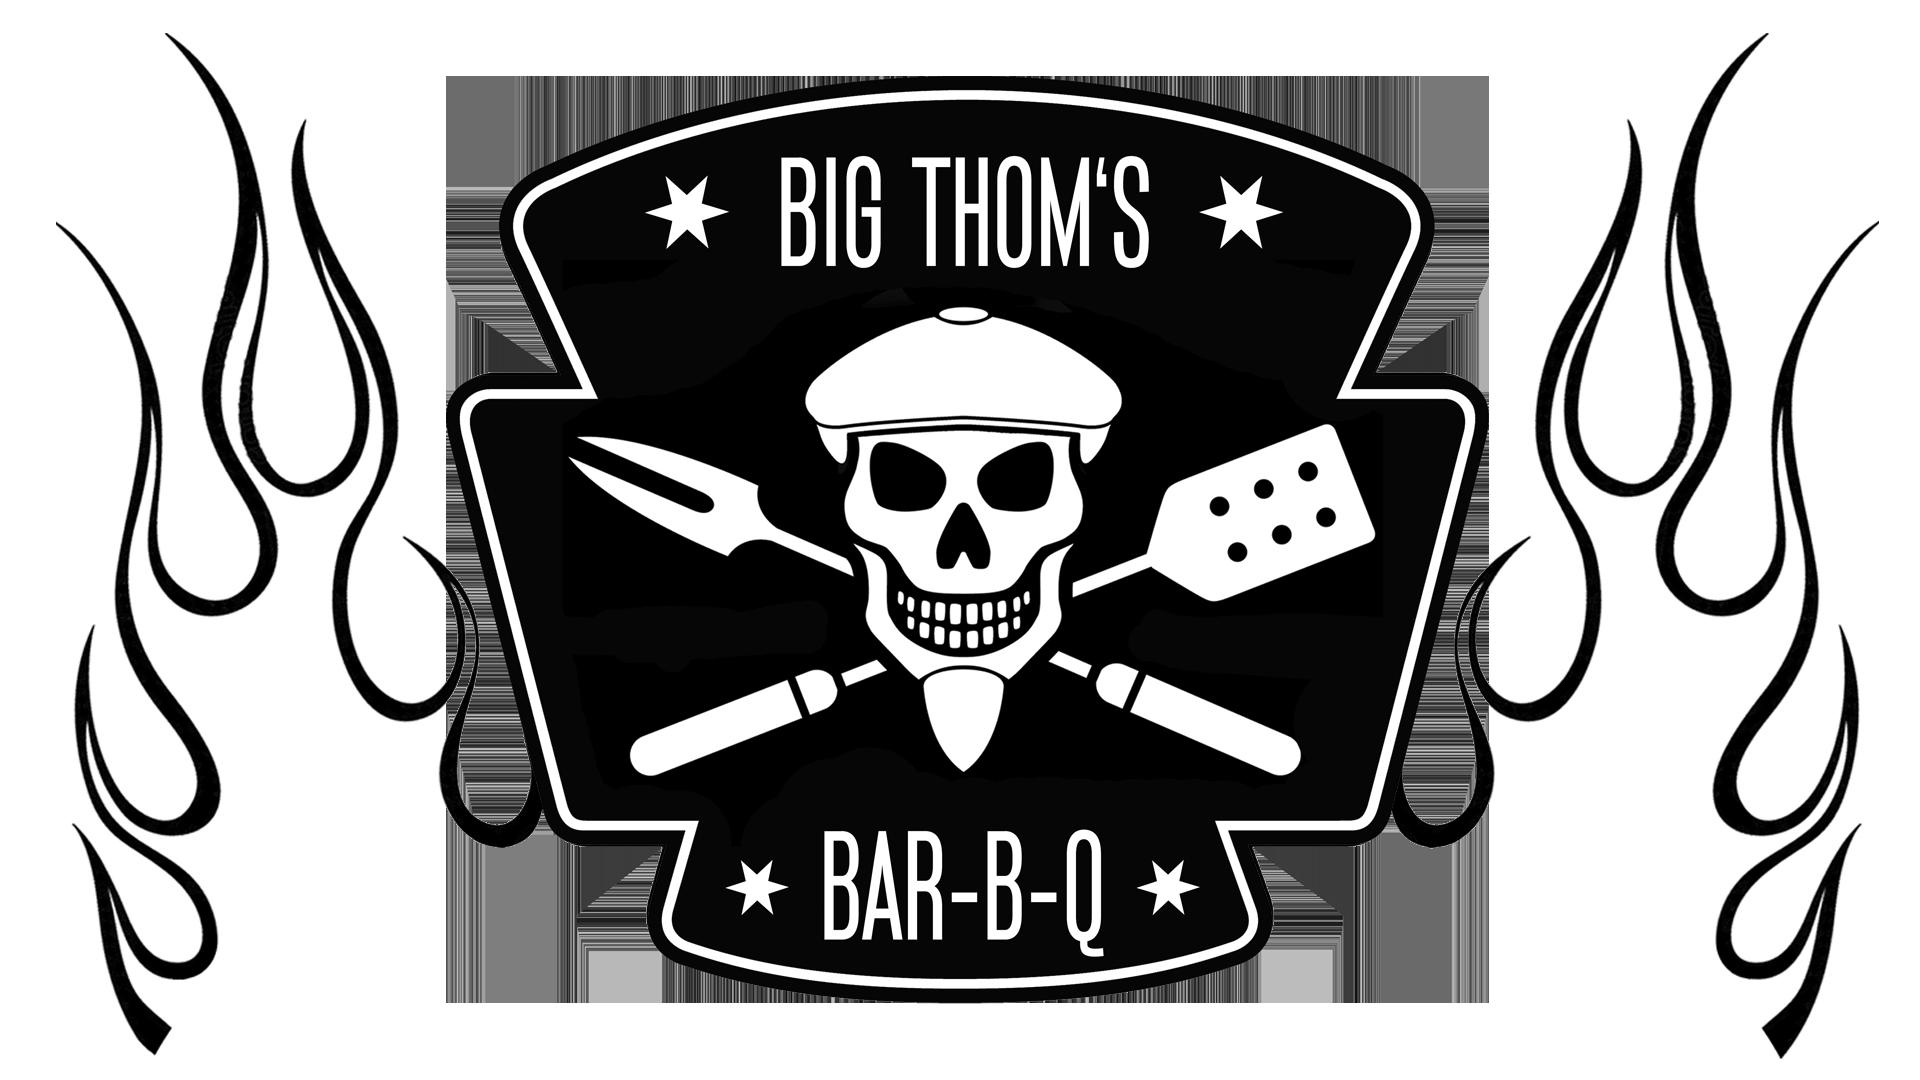 BIG THOM'S BAR-B-Q